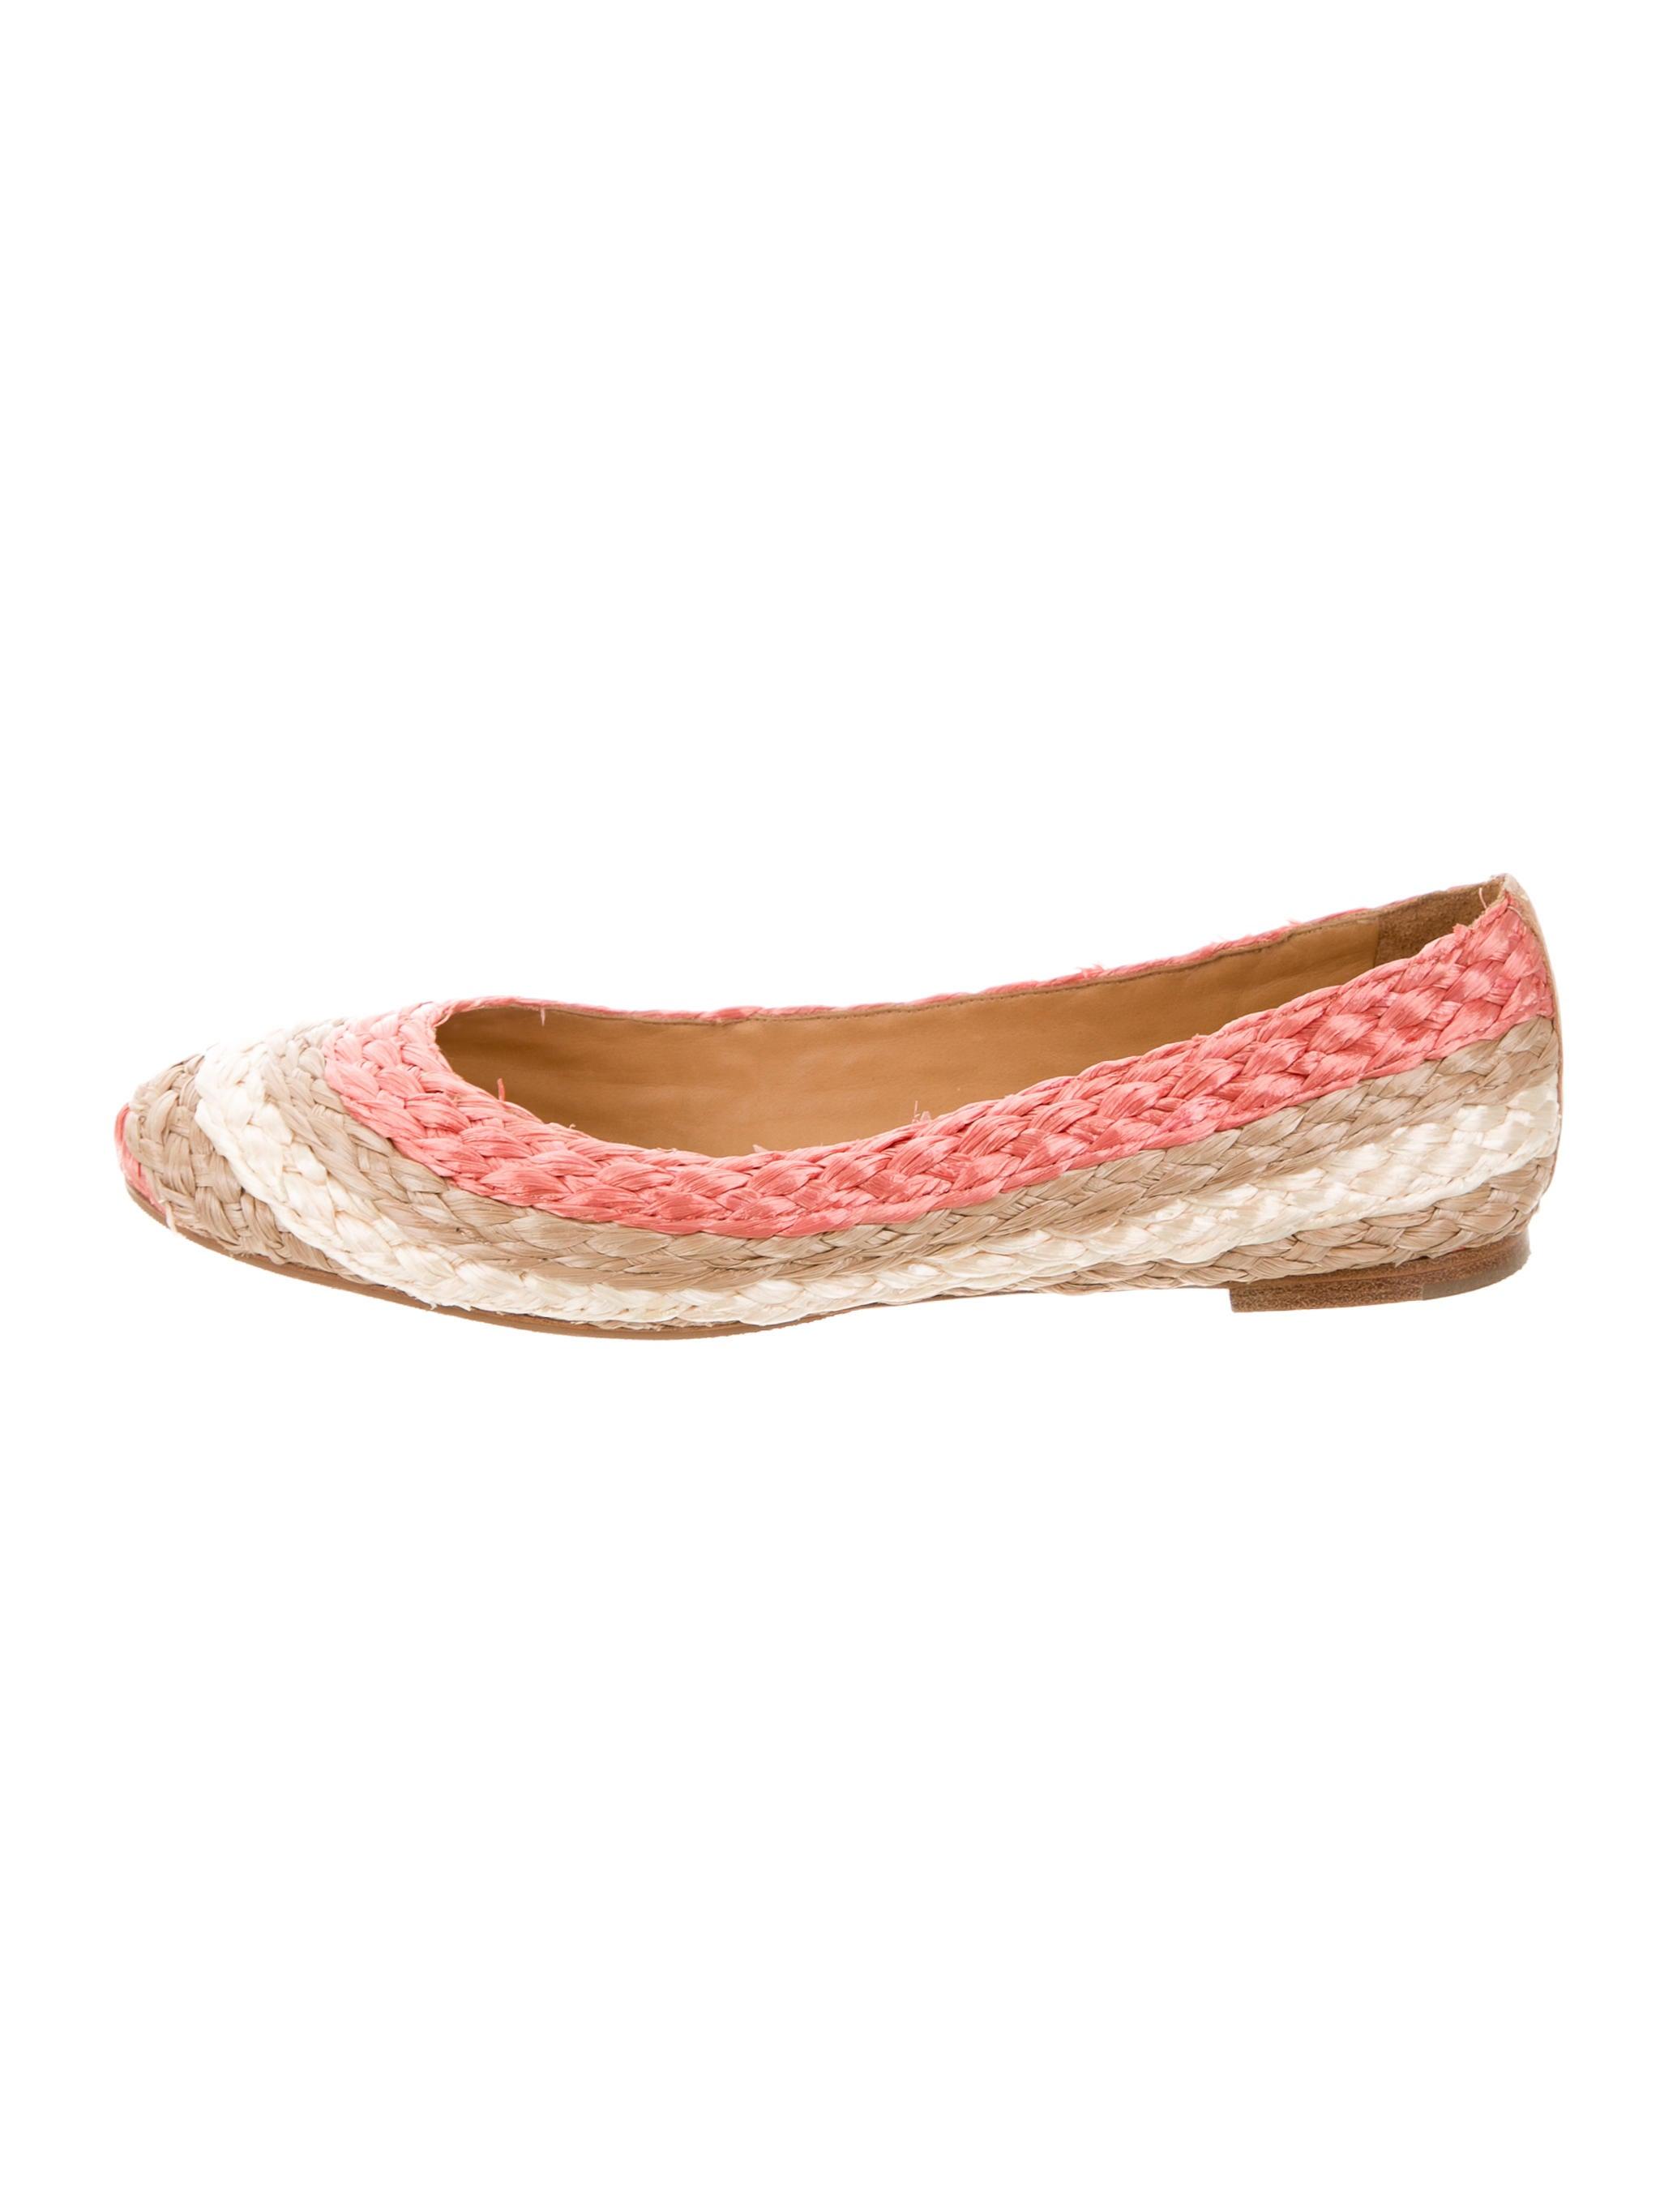 Chloé Raffia Round-Toe Flats best seller sizdHP